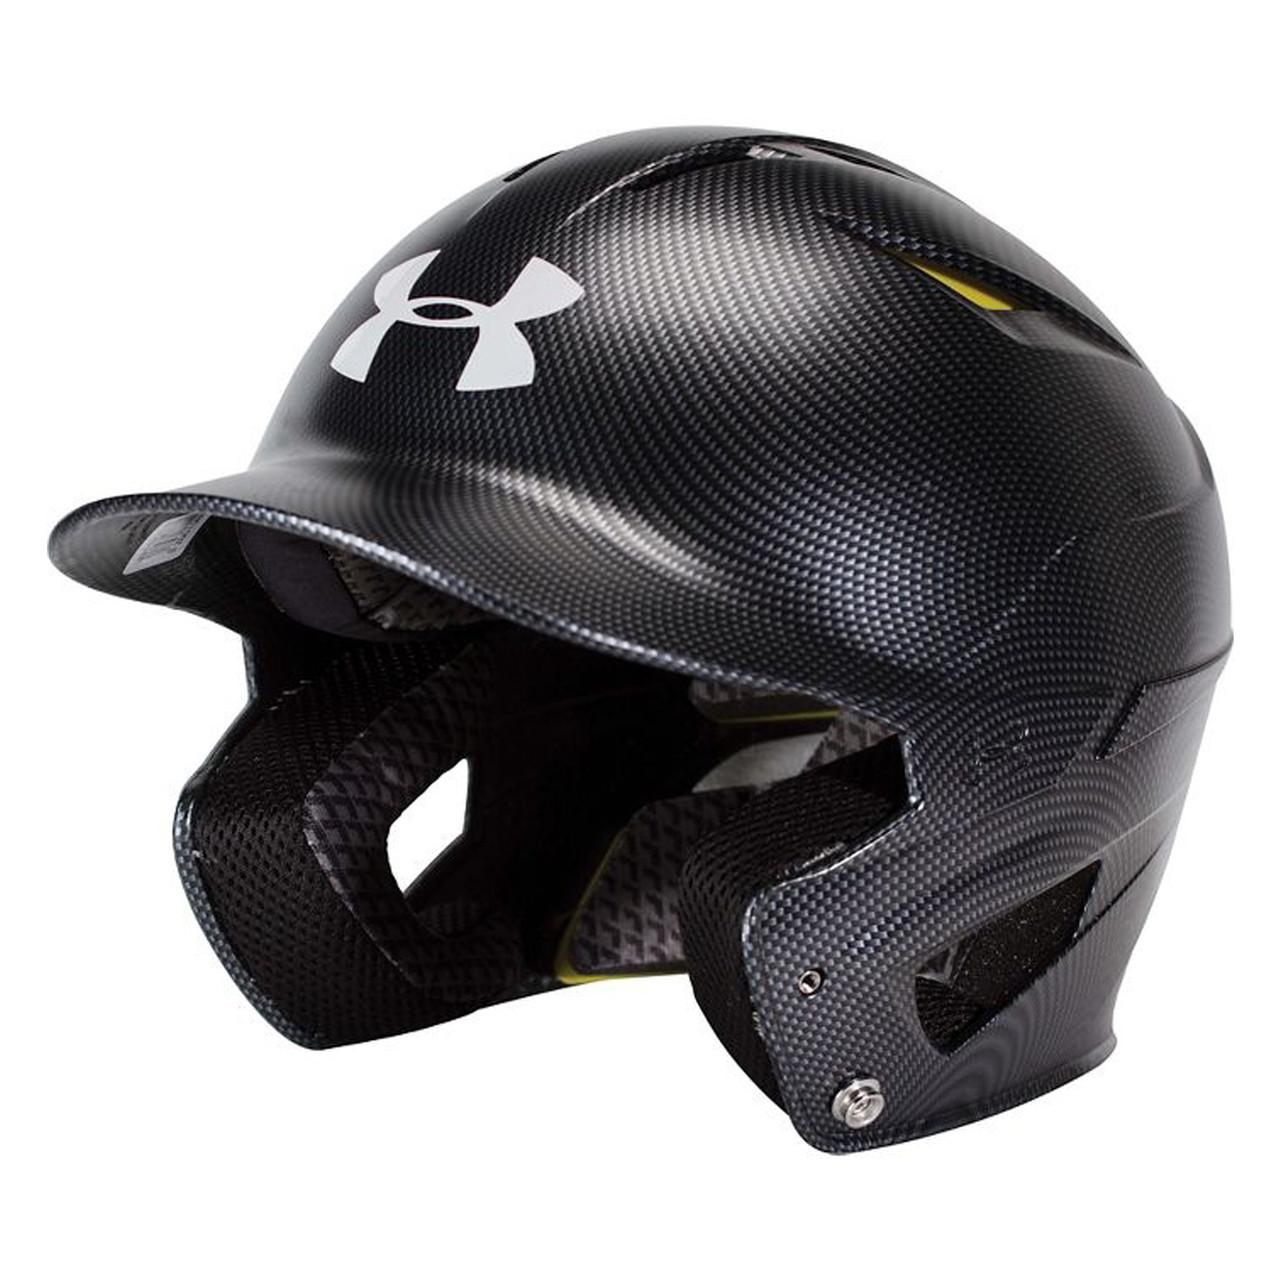 1303859f1eb Under Armour Converge CarbonTech Senior Baseball Batting Helmet ...